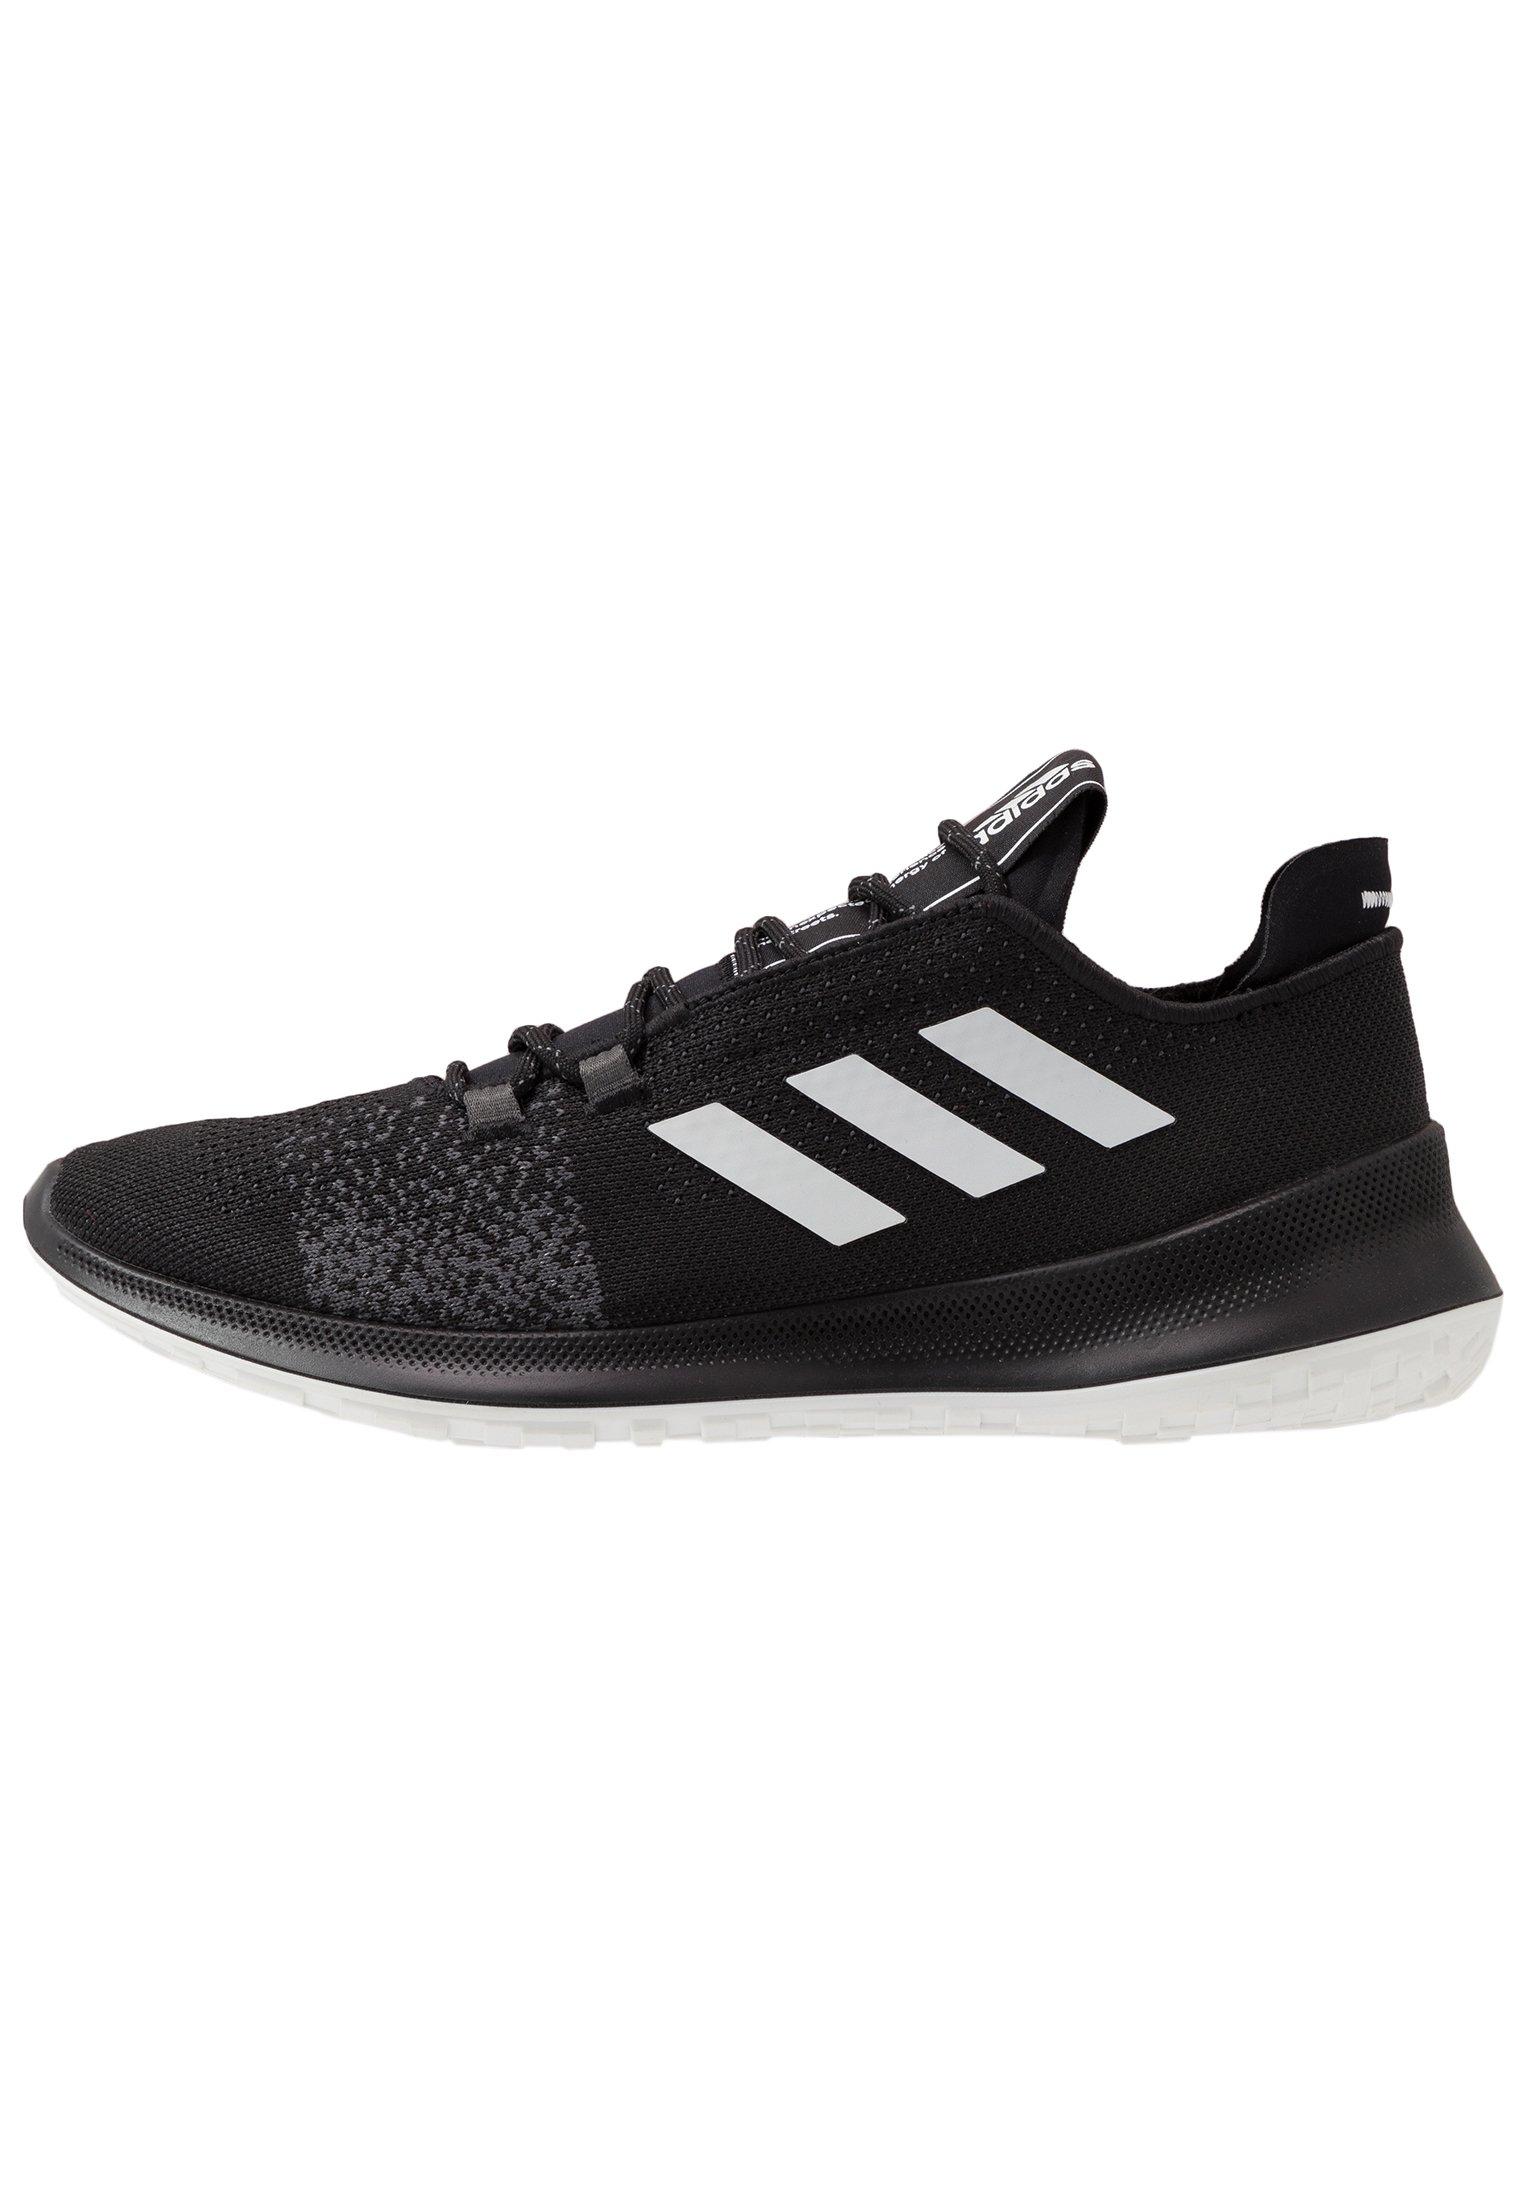 Adidas Performance Sensebounce Ace - Scarpe Running Neutre Core Black/footwear White/grey Six WdzNCs0